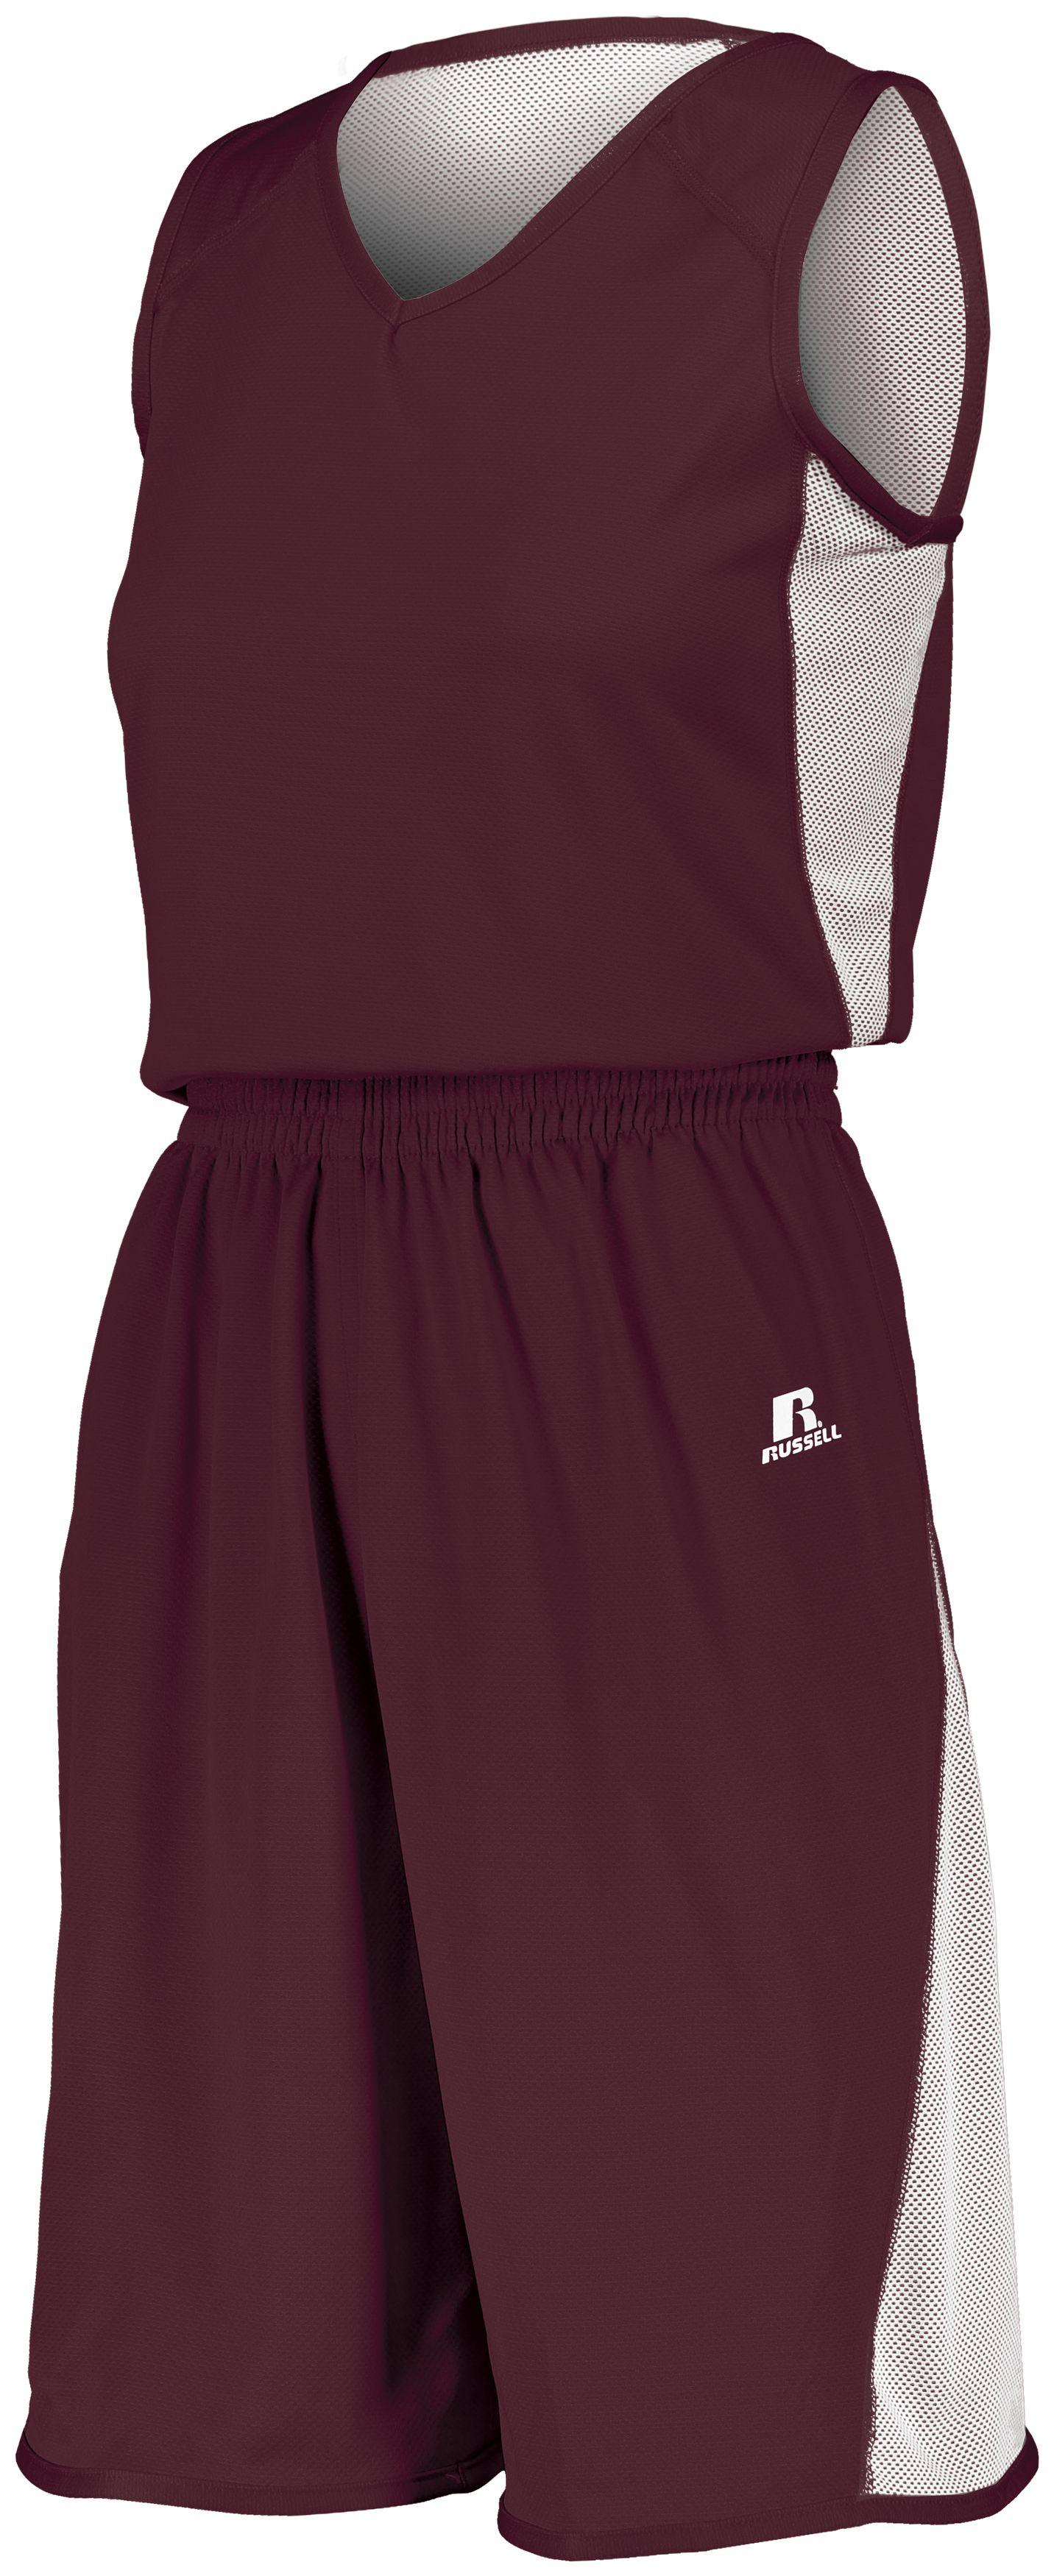 Ladies Undivided Single Ply Reversible Shorts - MAROON/WHITE